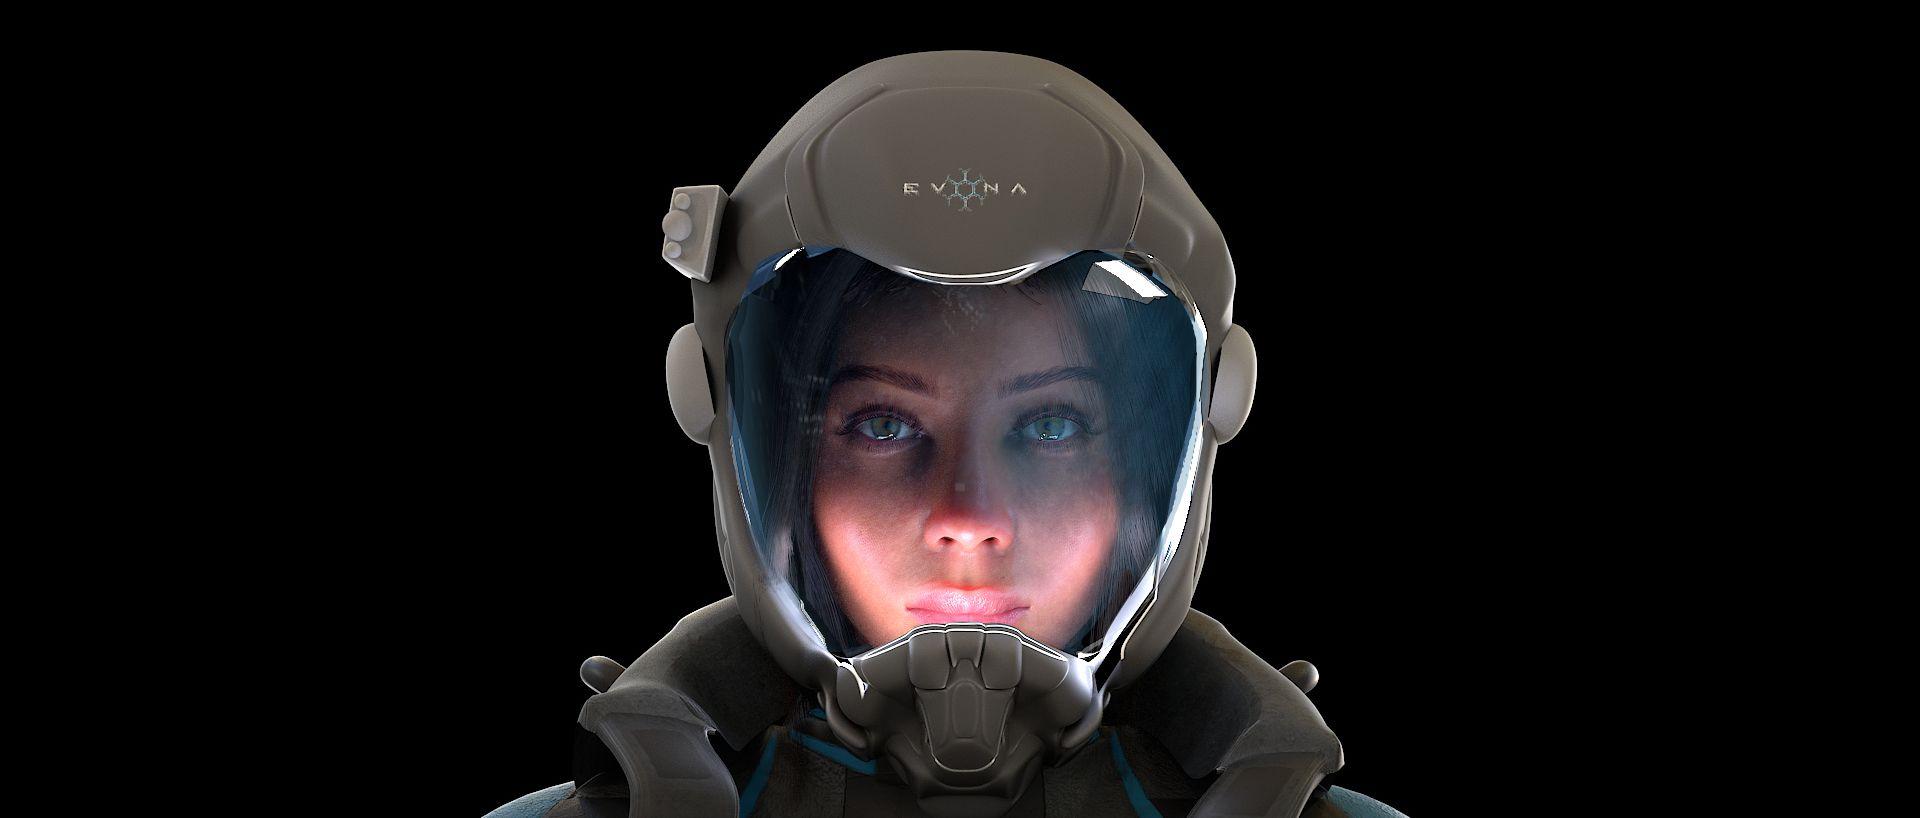 hero_woman_2K_v001_md_Layer_003